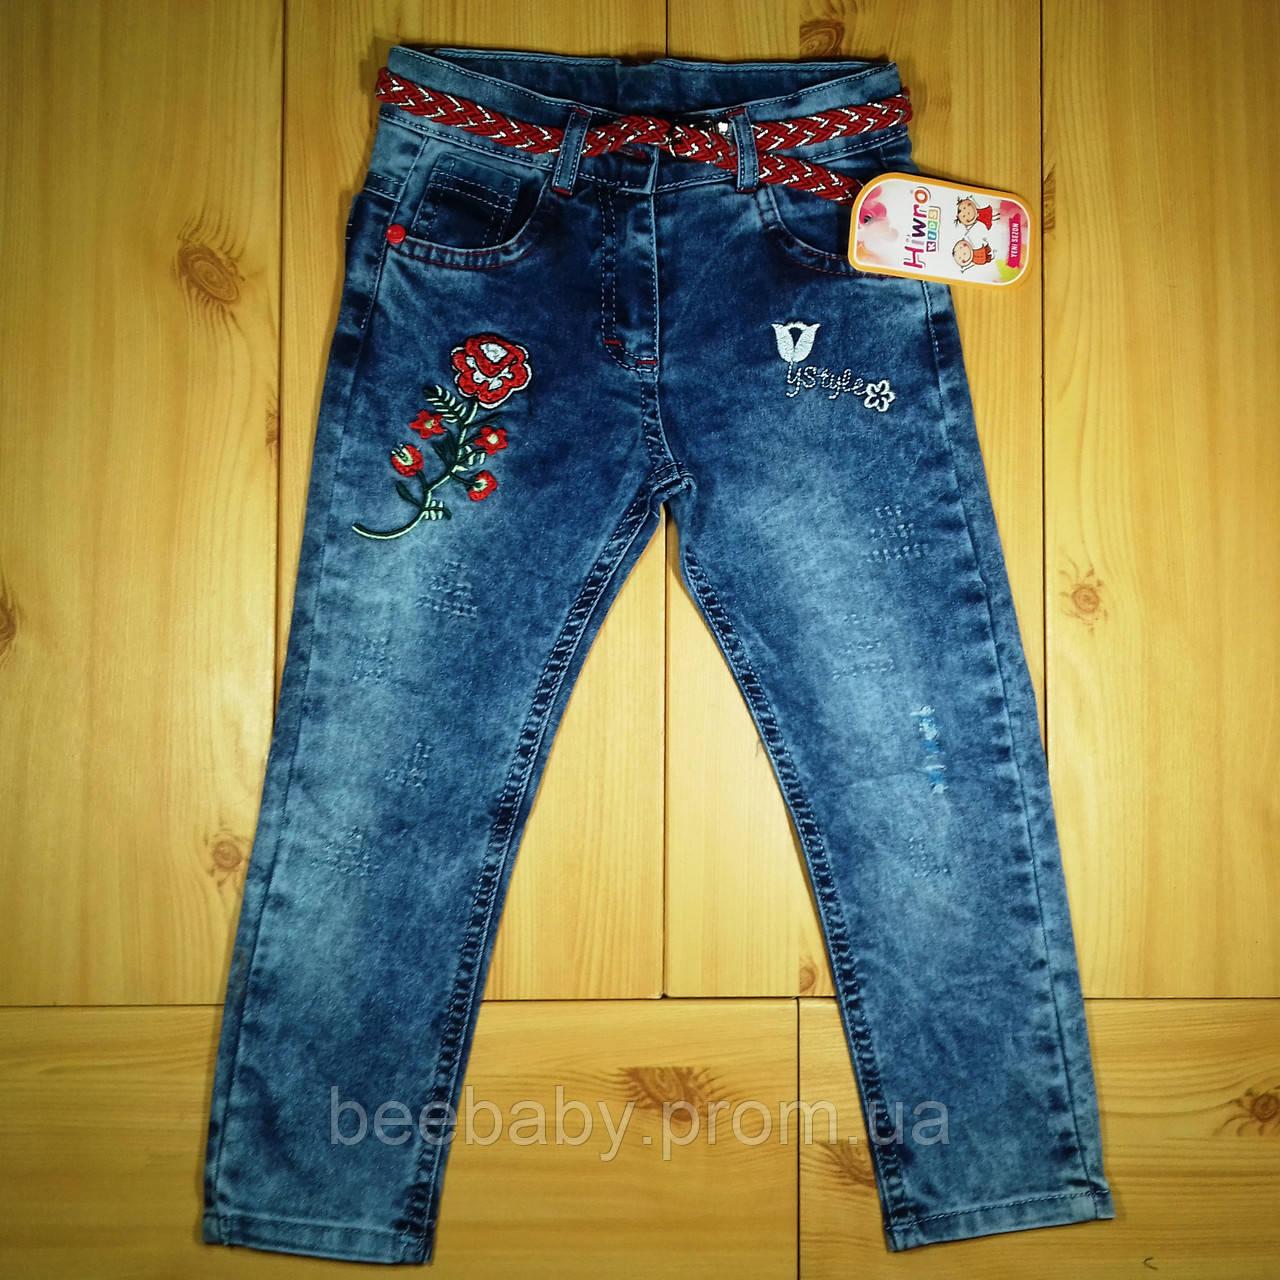 97abc89931e0a89 Детские джинсы для девочки рр. 98-122 Цветы Beebaby (Бибеби) - Beebaby